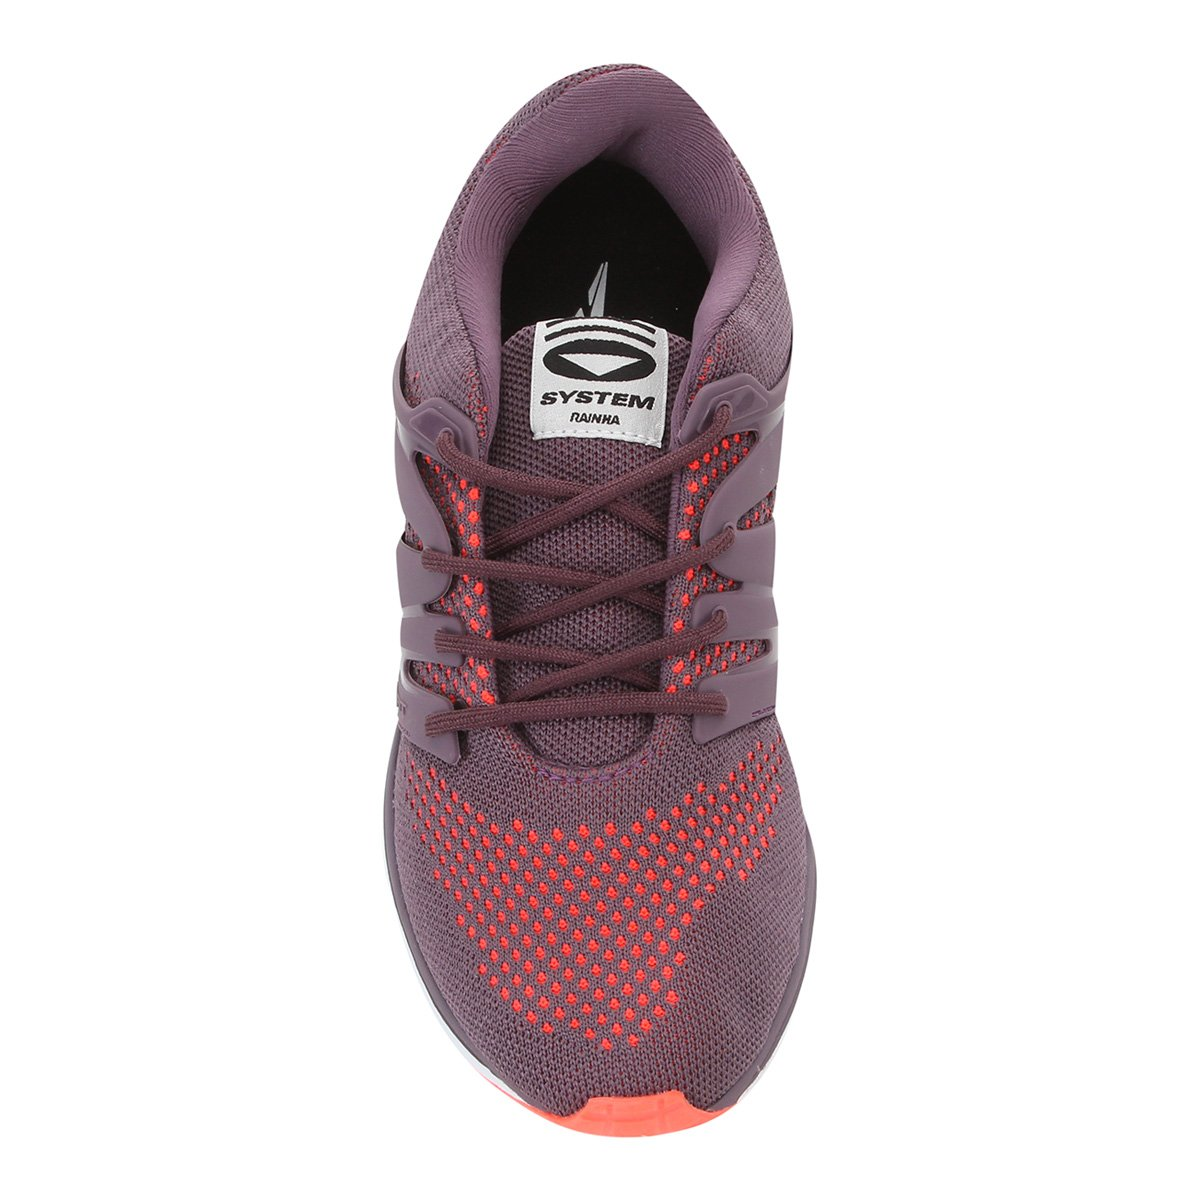 tenis mizuno feminino roxo e laranja 99